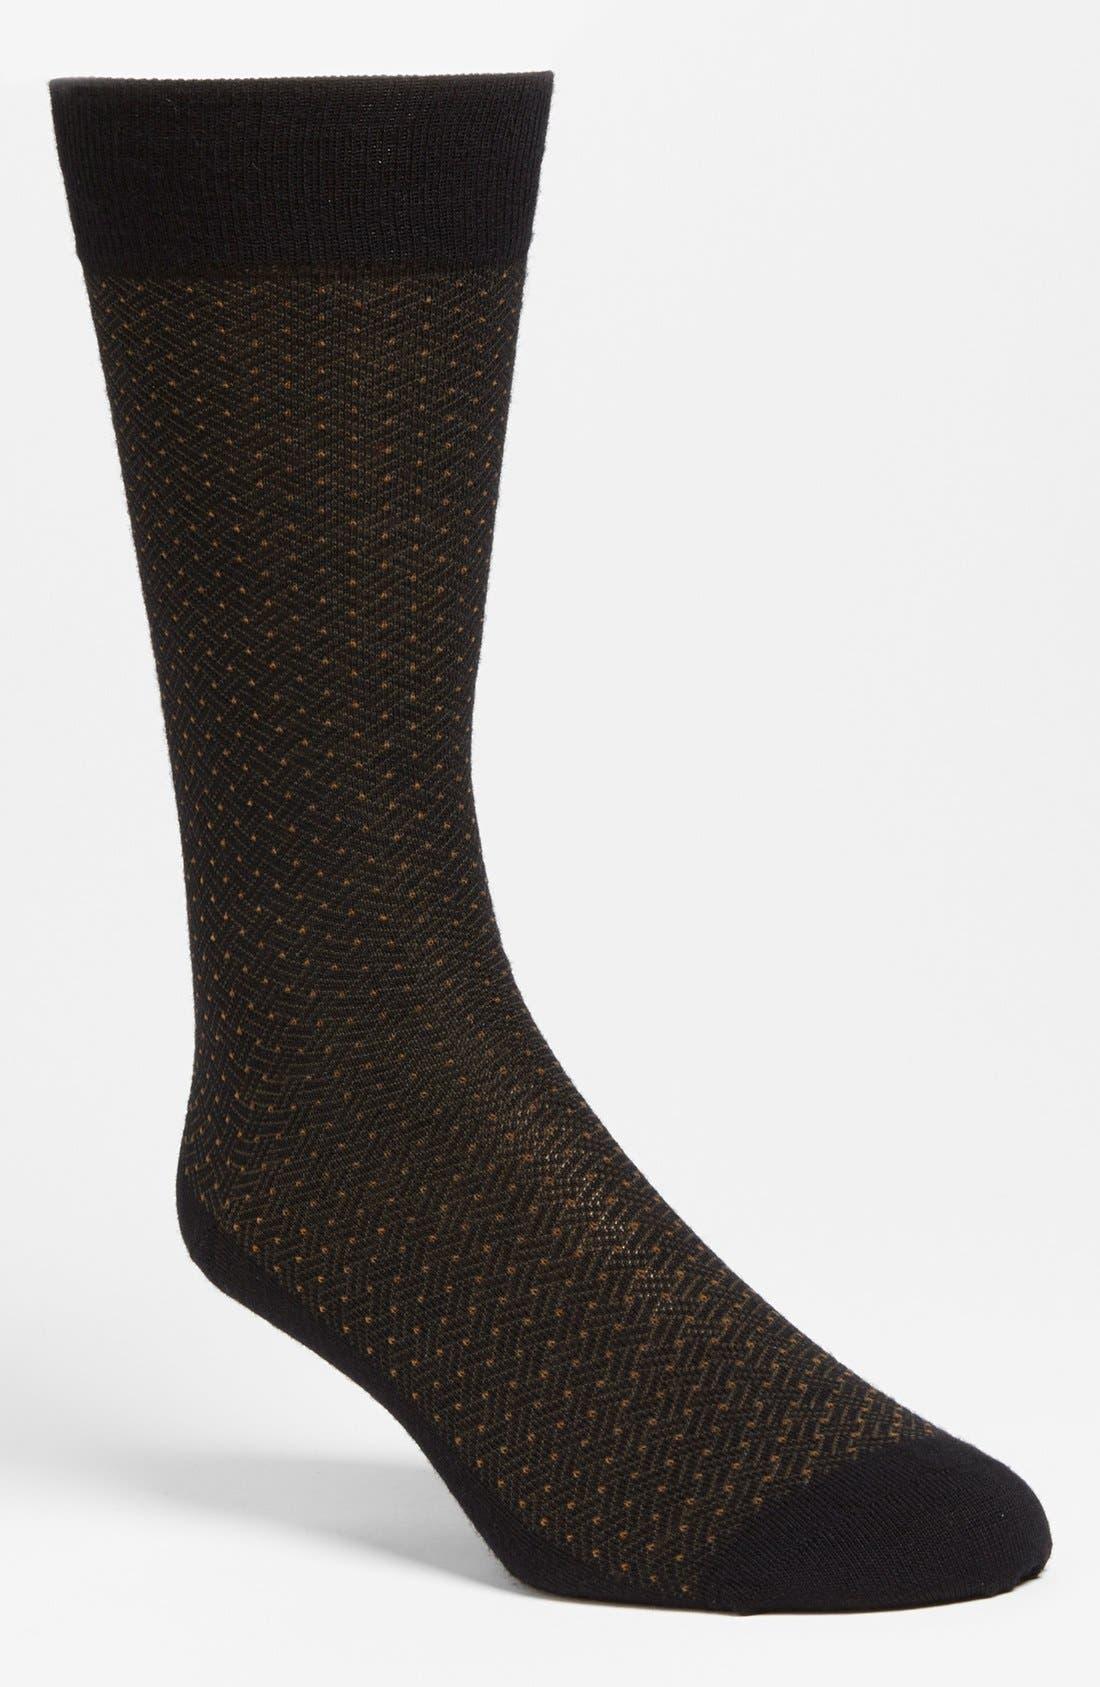 Alternate Image 1 Selected - Pantherella 'Albion' Dot Socks